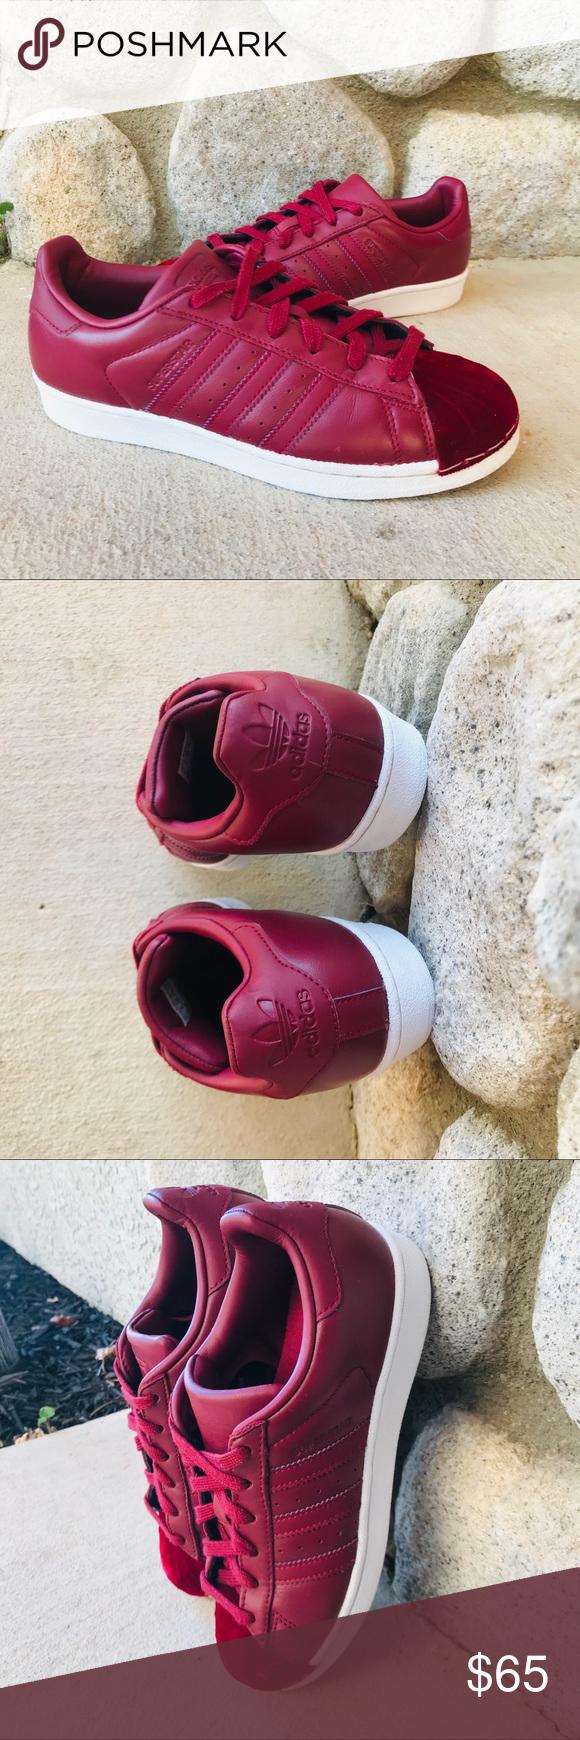 adidas superstar red velvet